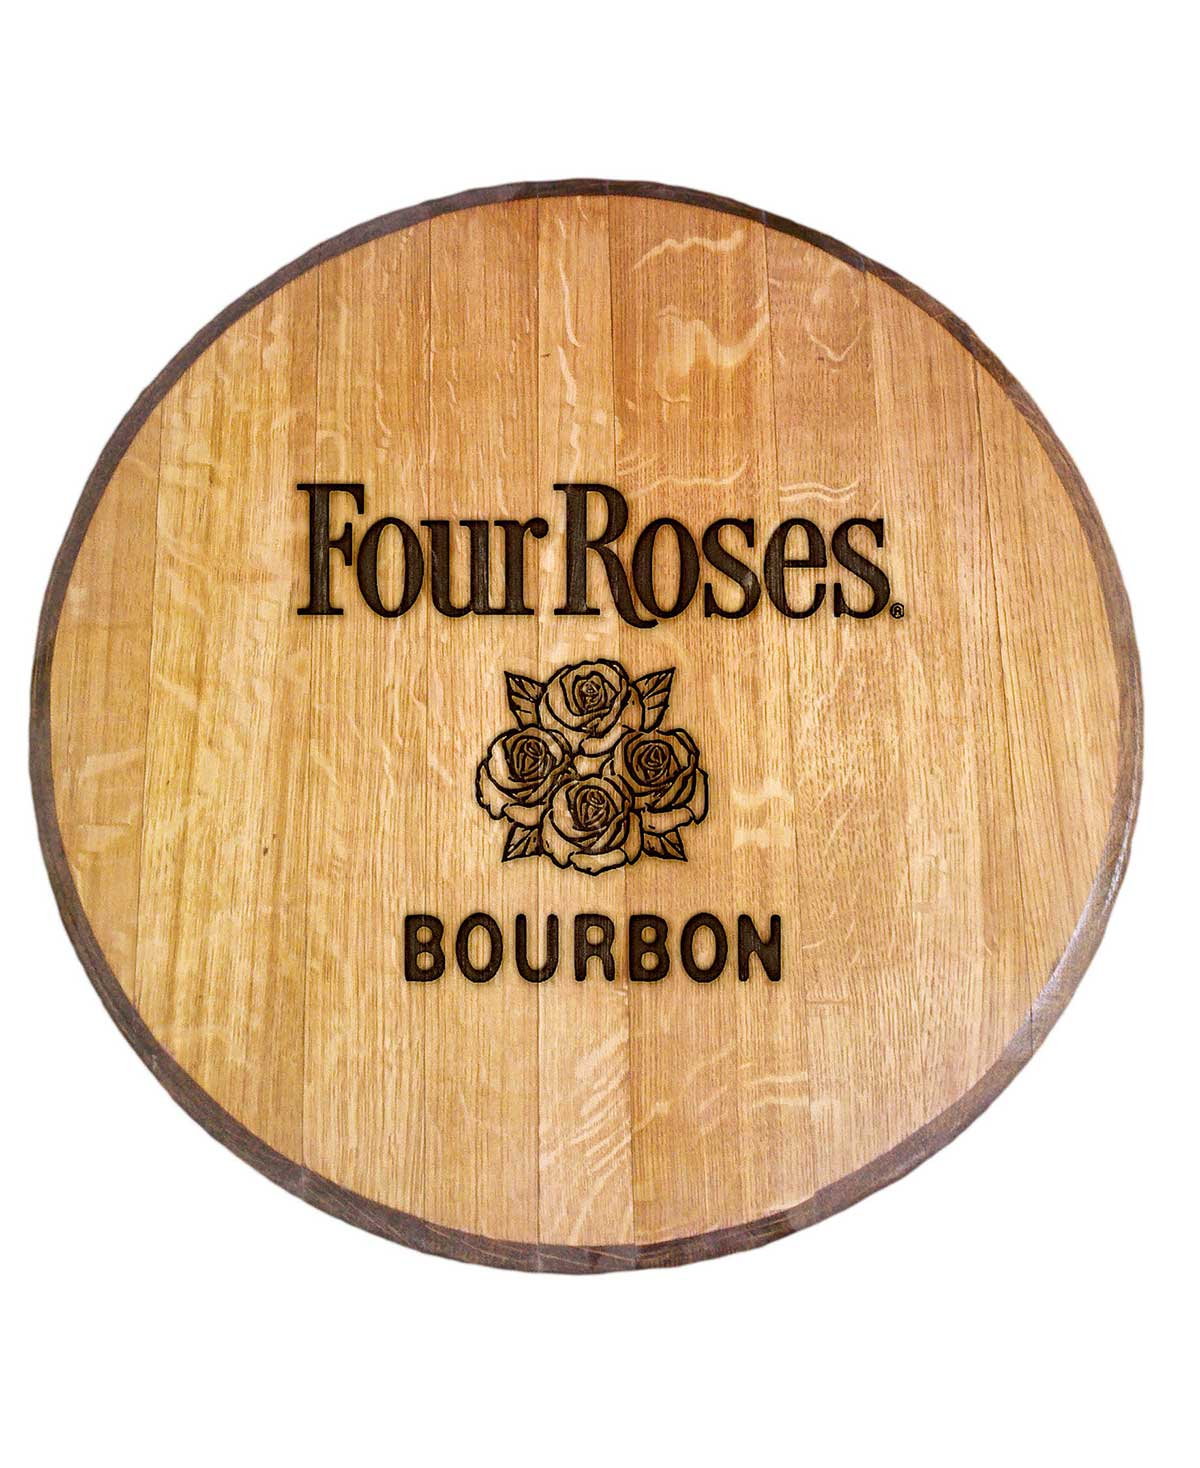 Four Roses Bourbon Barrel Head